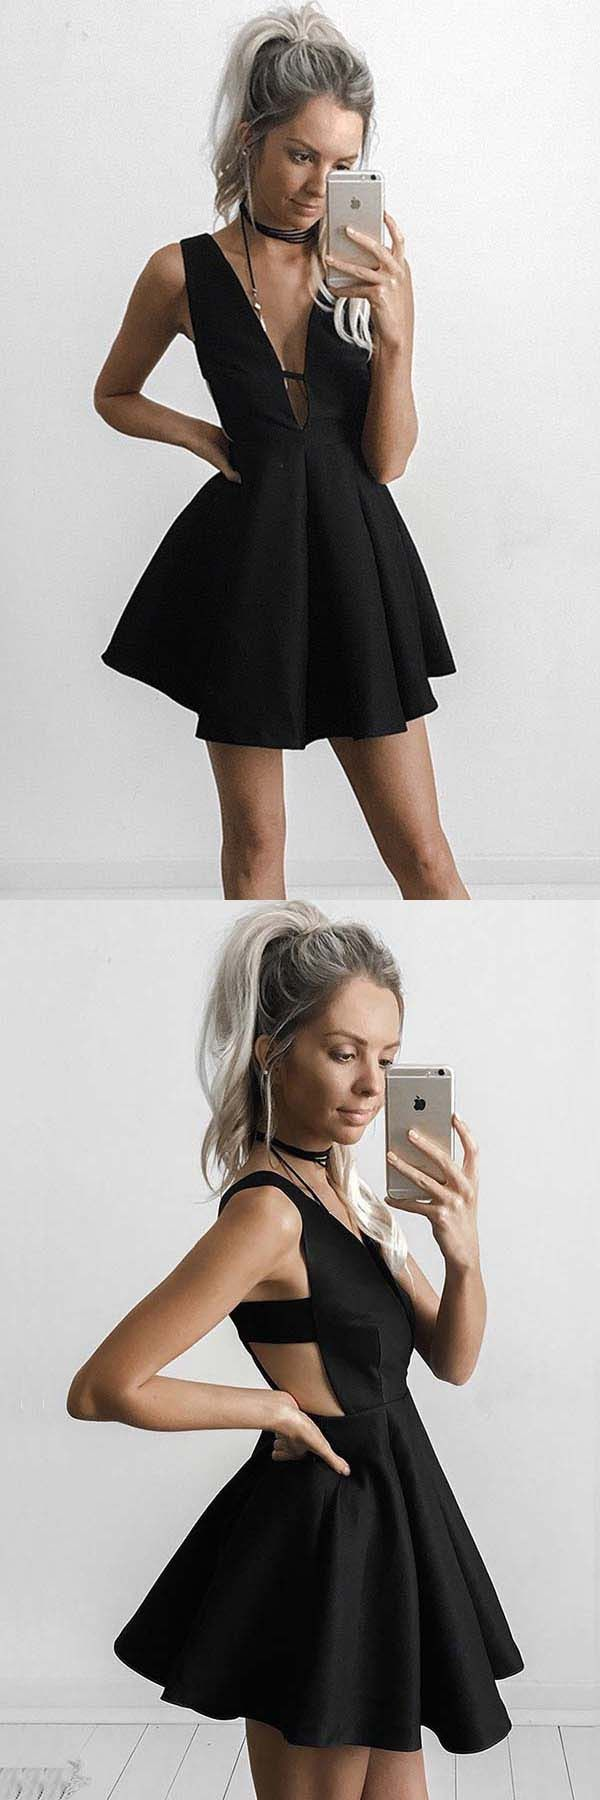 Aline deep vneck short cut out black satin homecoming dress pd